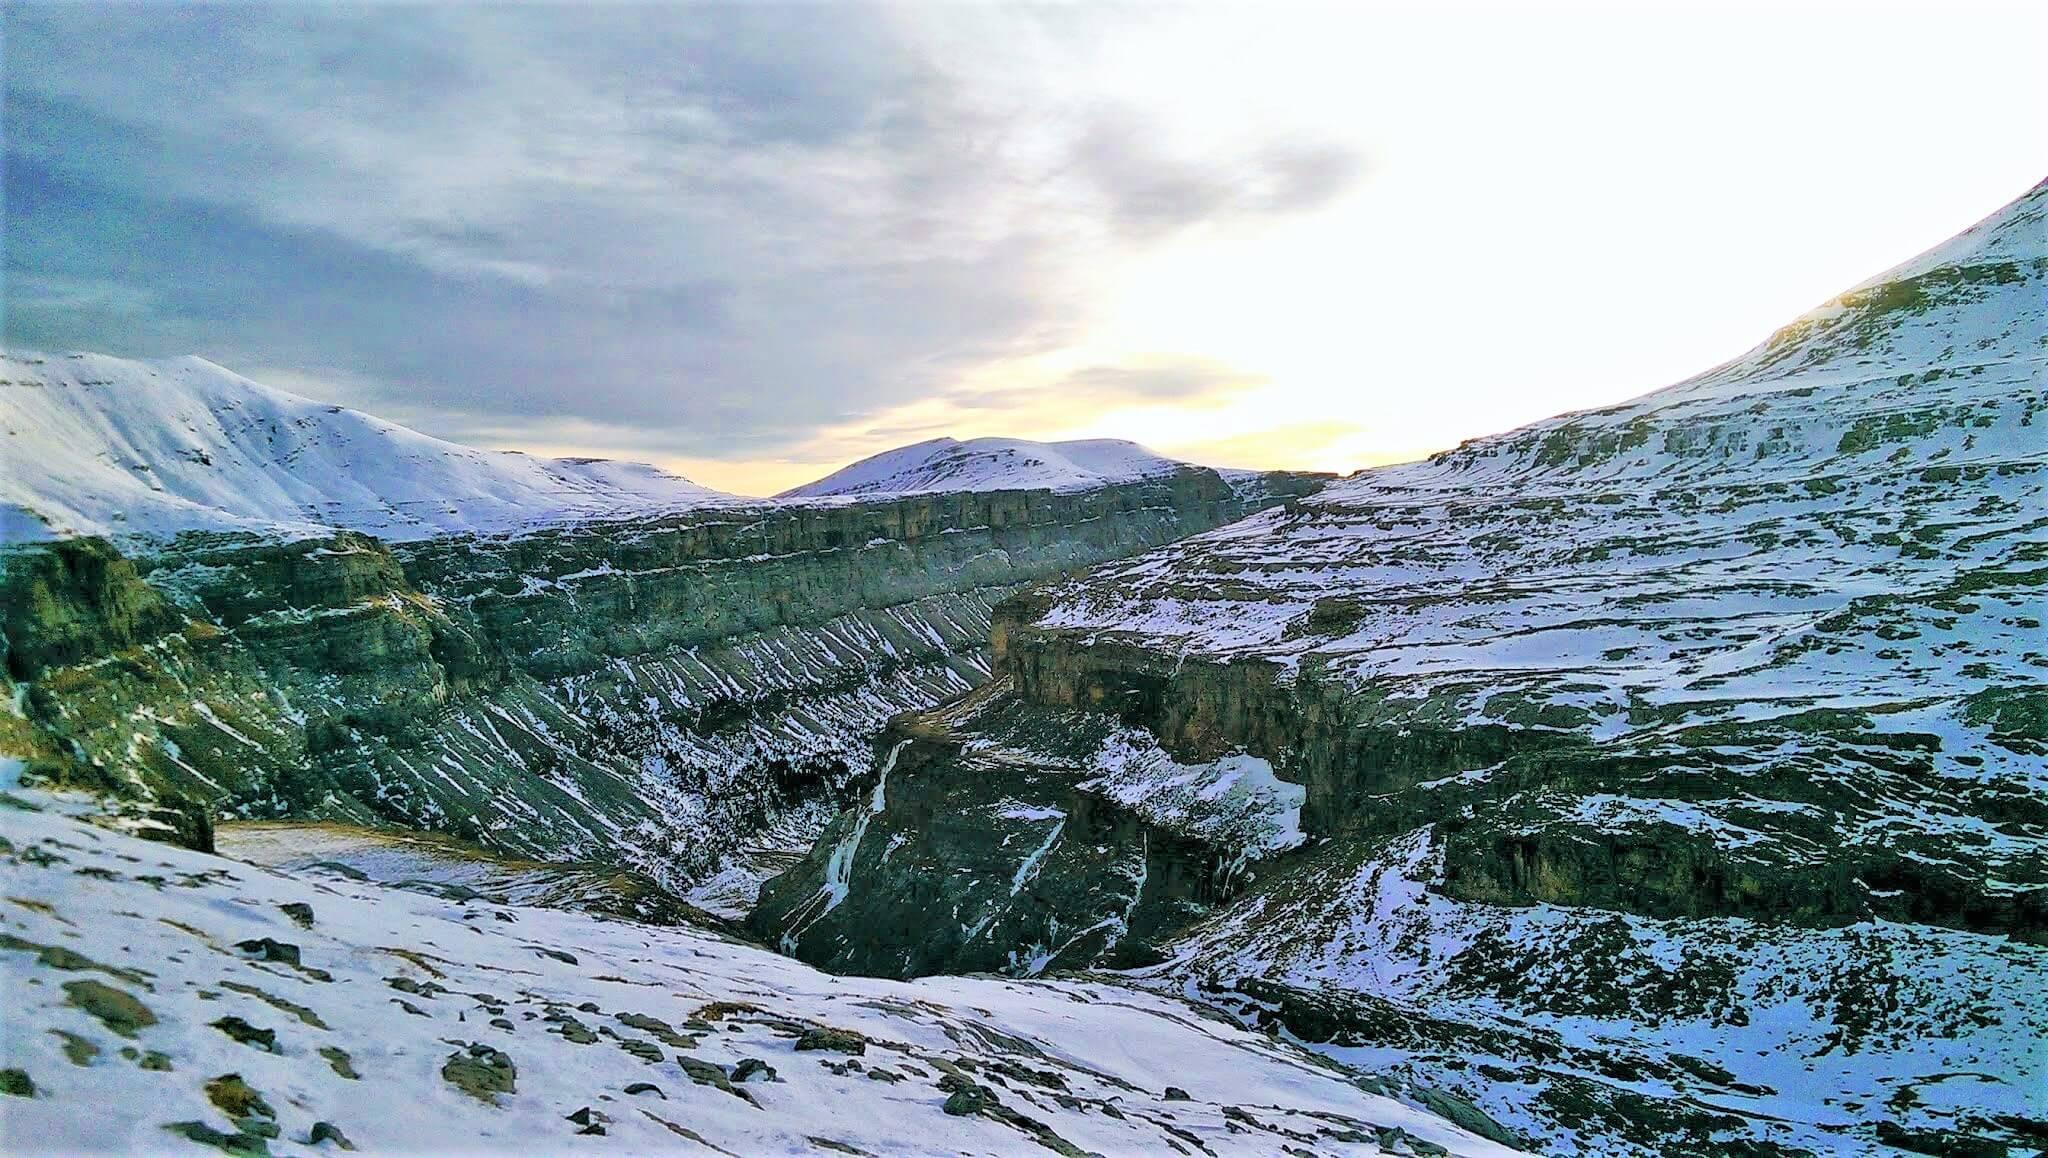 Valle de Ordesa Nevado